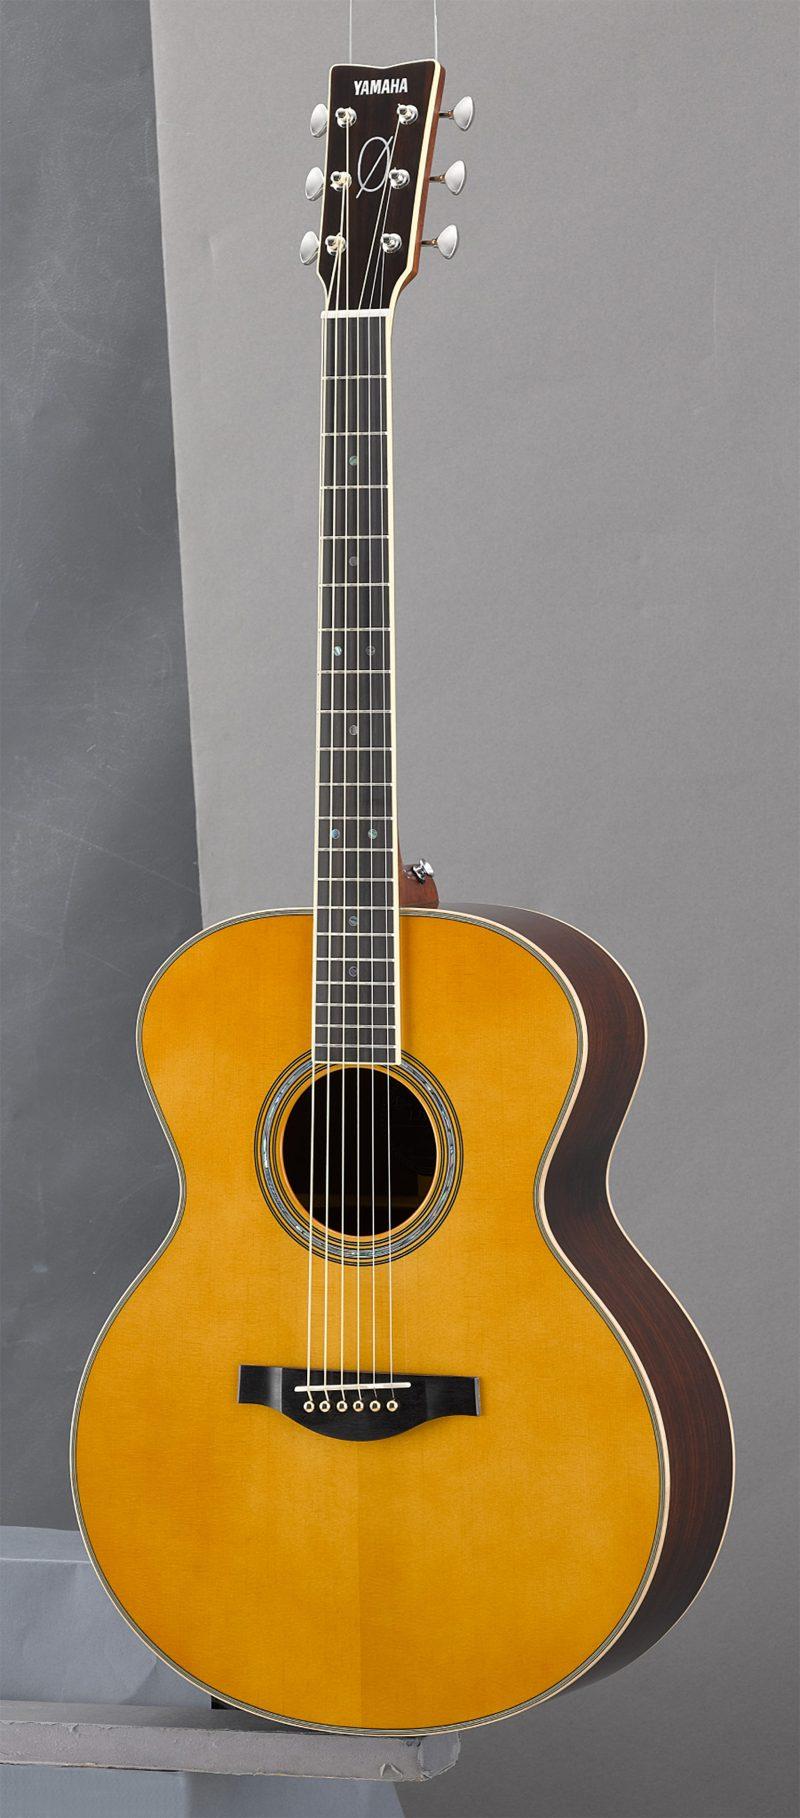 Yamaha billy corgan special edition acoustic guitar for Yamaha l series guitars